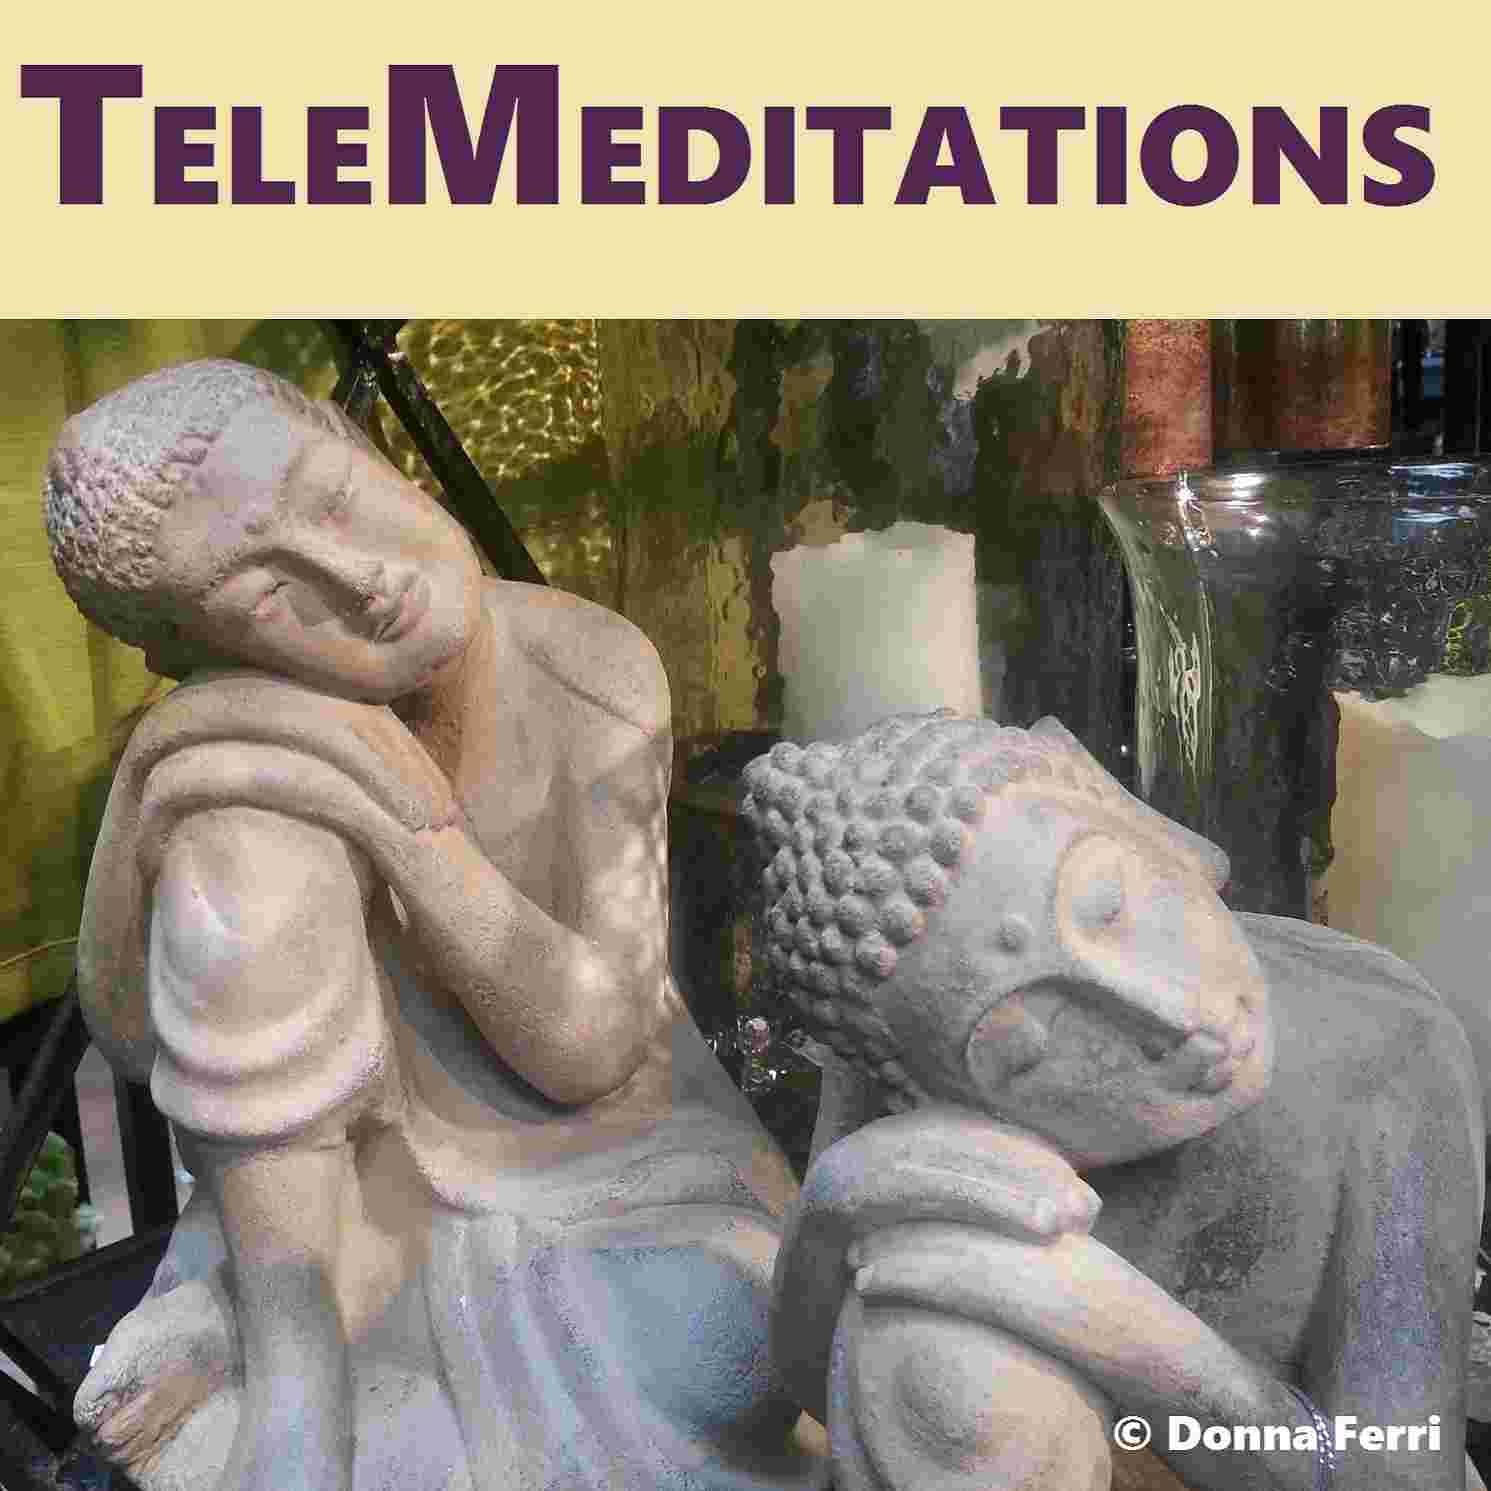 TeleMeditations.com